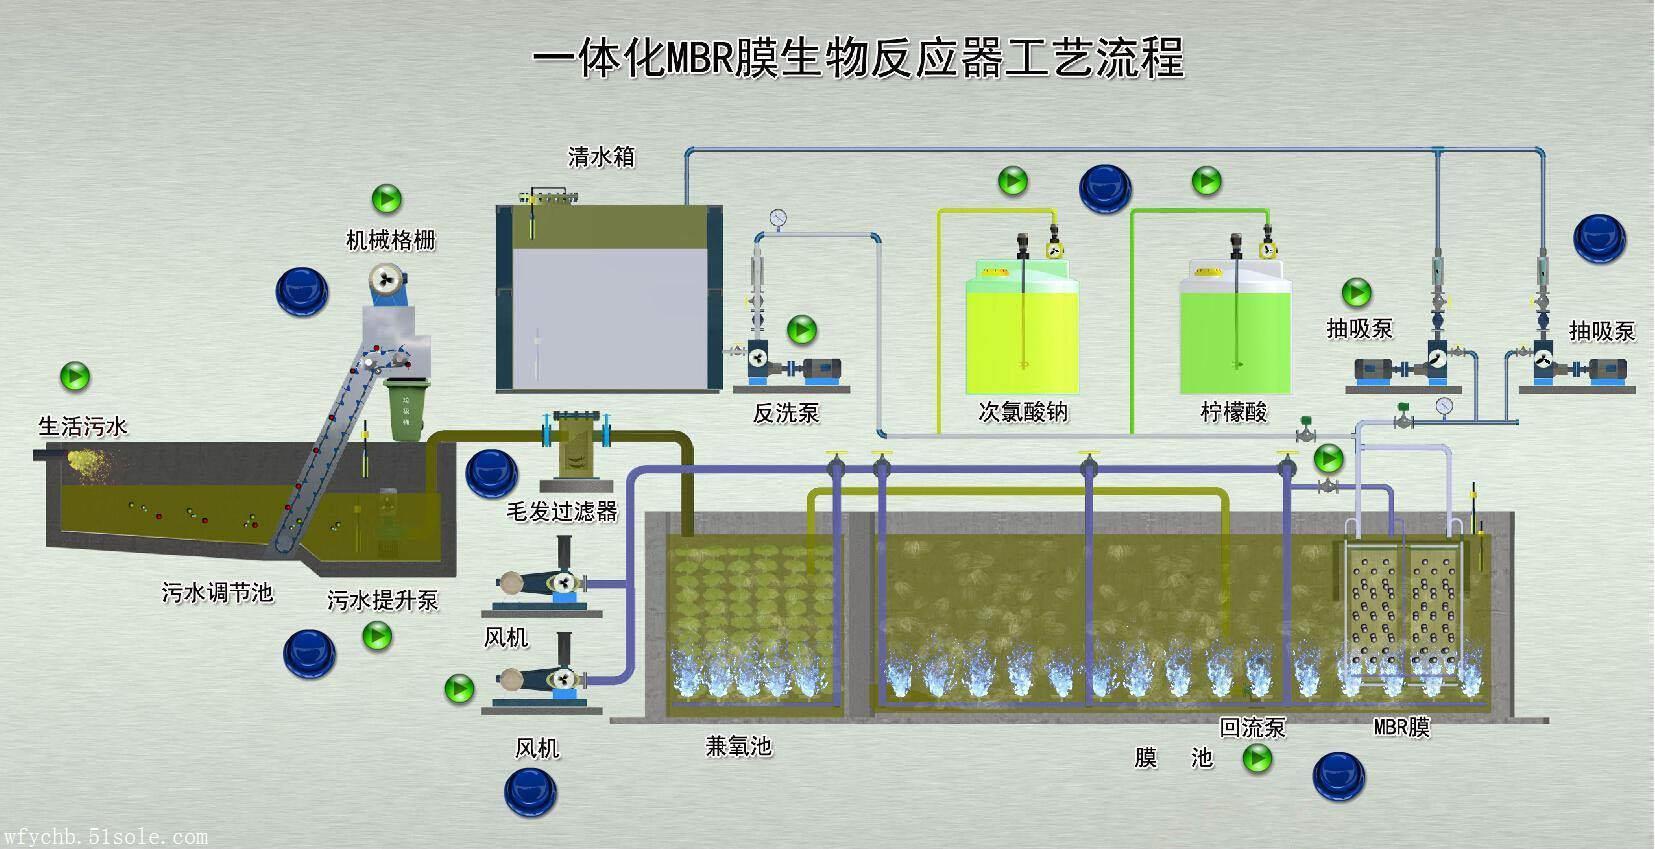 WSZ-AO型地埋式一体化污水处理设备主要由调节池、厌氧池、好氧池、沉淀池、污泥池、消毒池组成。   调节池:WSZ-AO系列调节时间为6小时。   厌氧池:WSZ-AO系列厌氧池污水在池内的停留时间 2小时,填料为弹性立体填料,填料比表面积为200m2/m3。   好氧池:WSZ-AO系列生物接触氧化他,污水在池内的停留时间为3-6小时,填料为弹性立体填料,填料比表面积为200m2/m3。   二沉池:WSZ-AO系列二沉池为旋流式沉淀池,表面负荷为1.